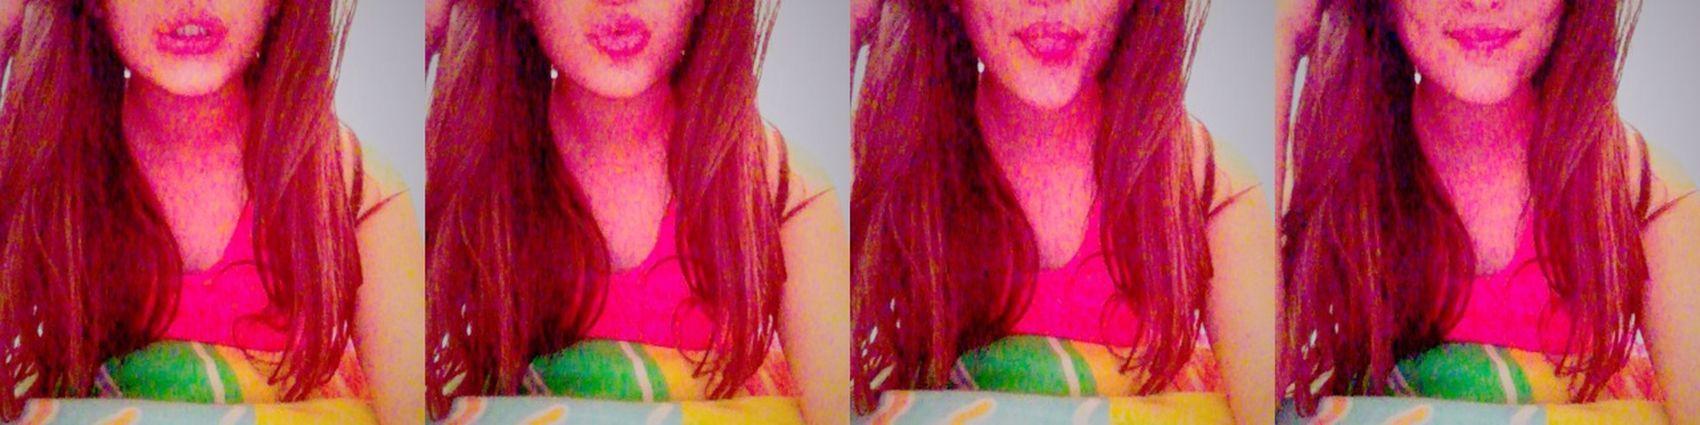 Cute♡ Kisses ♥ That's Me